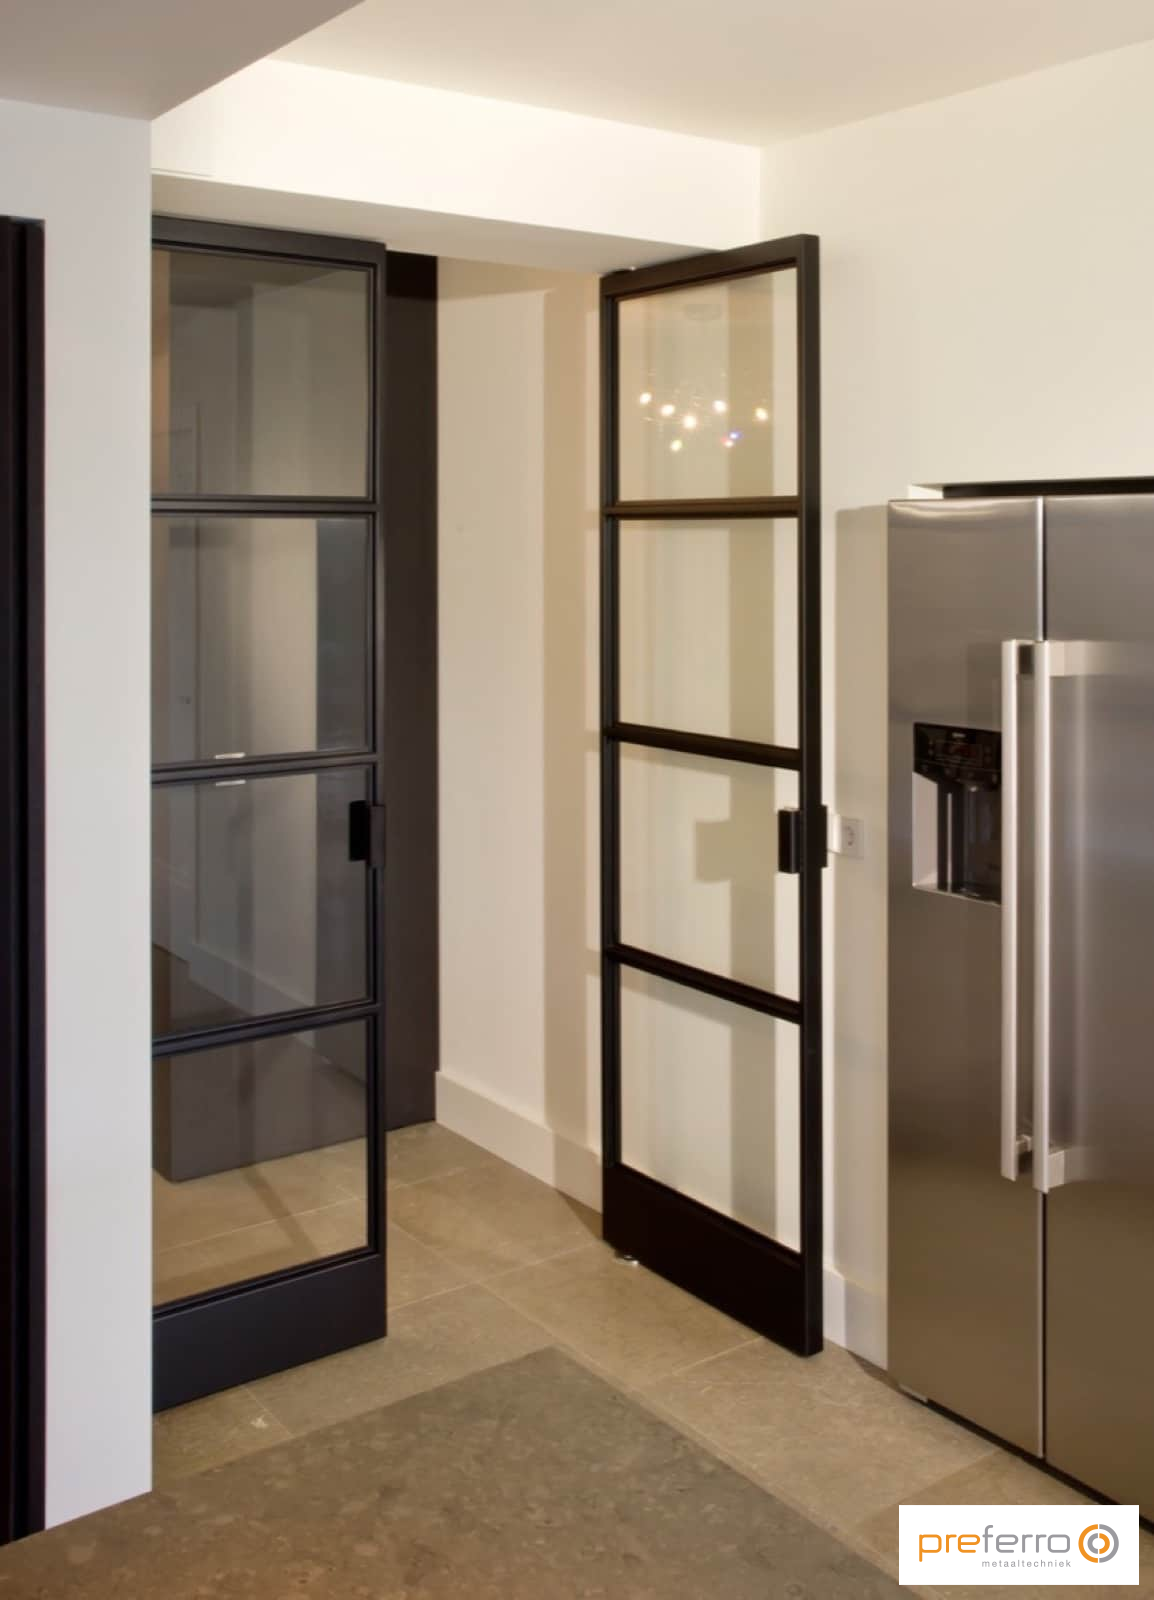 Dubbele binnendeuren met glas in keuken